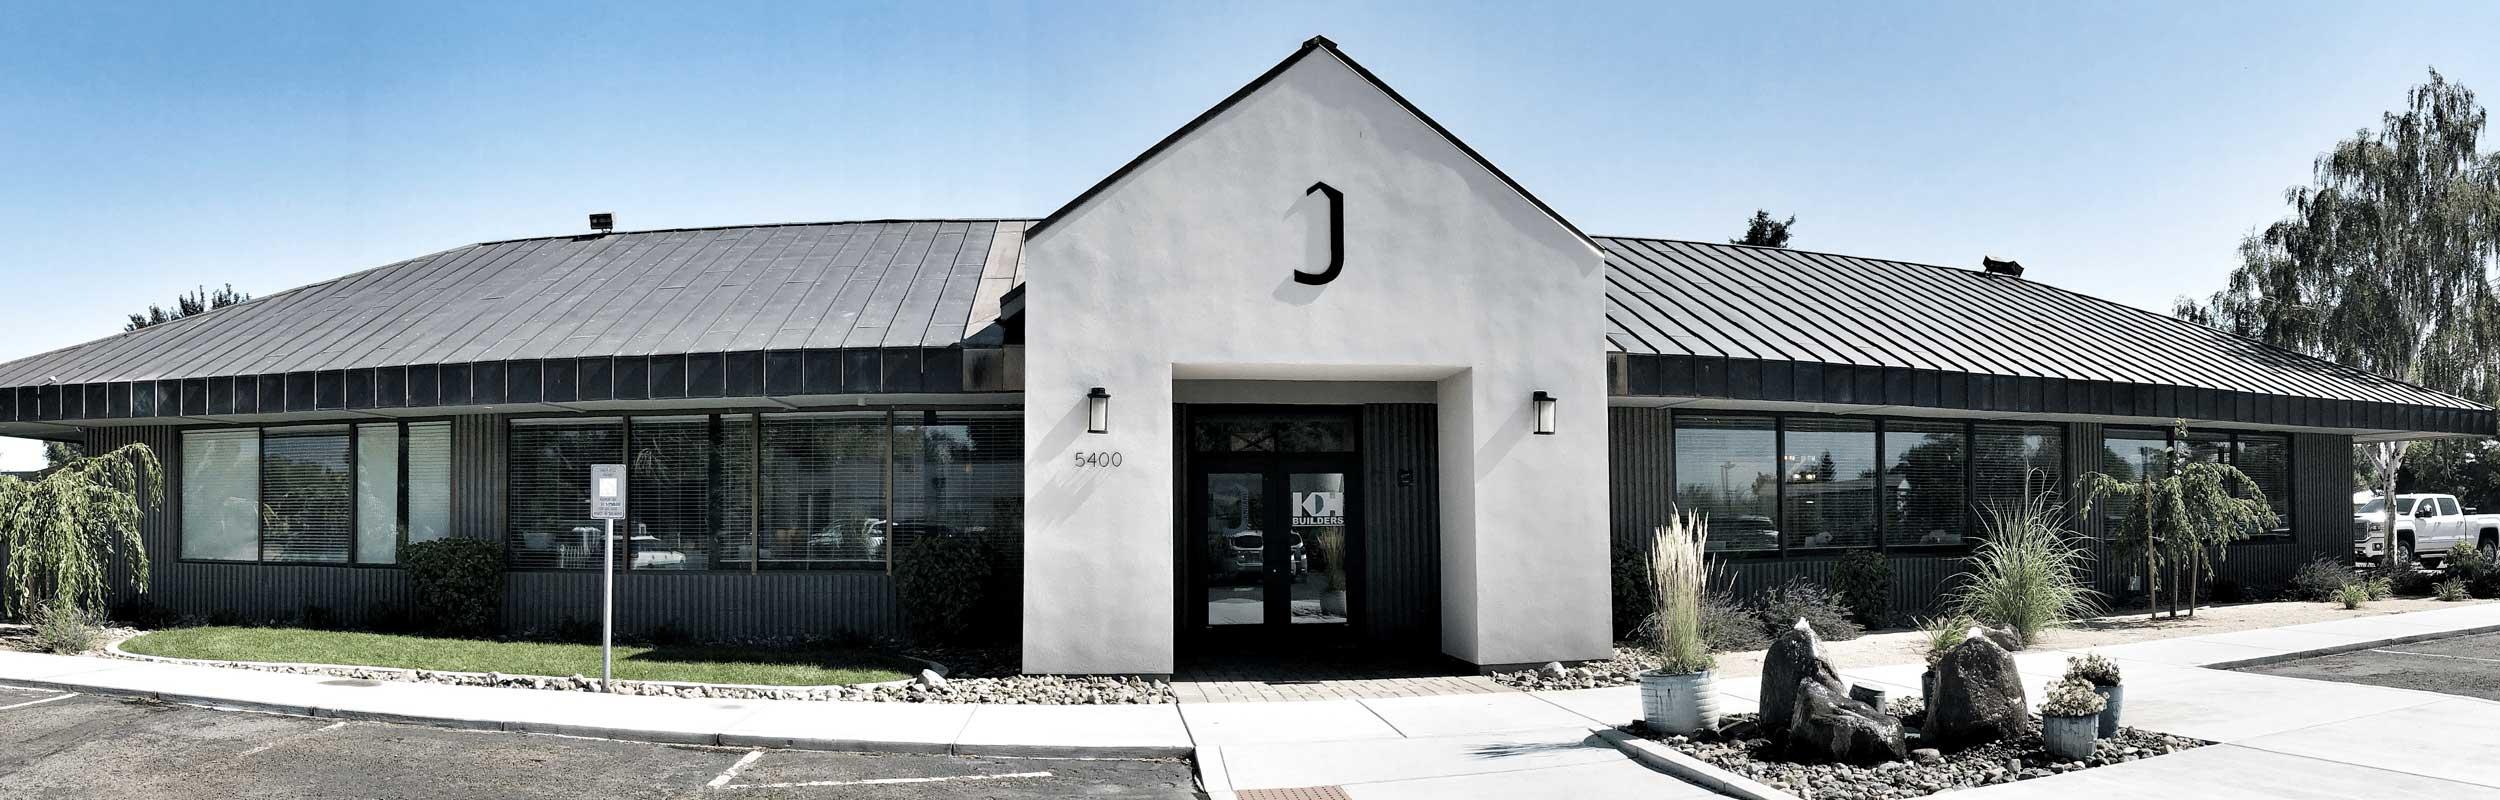 Jenuane Headquarters Reno Nevada